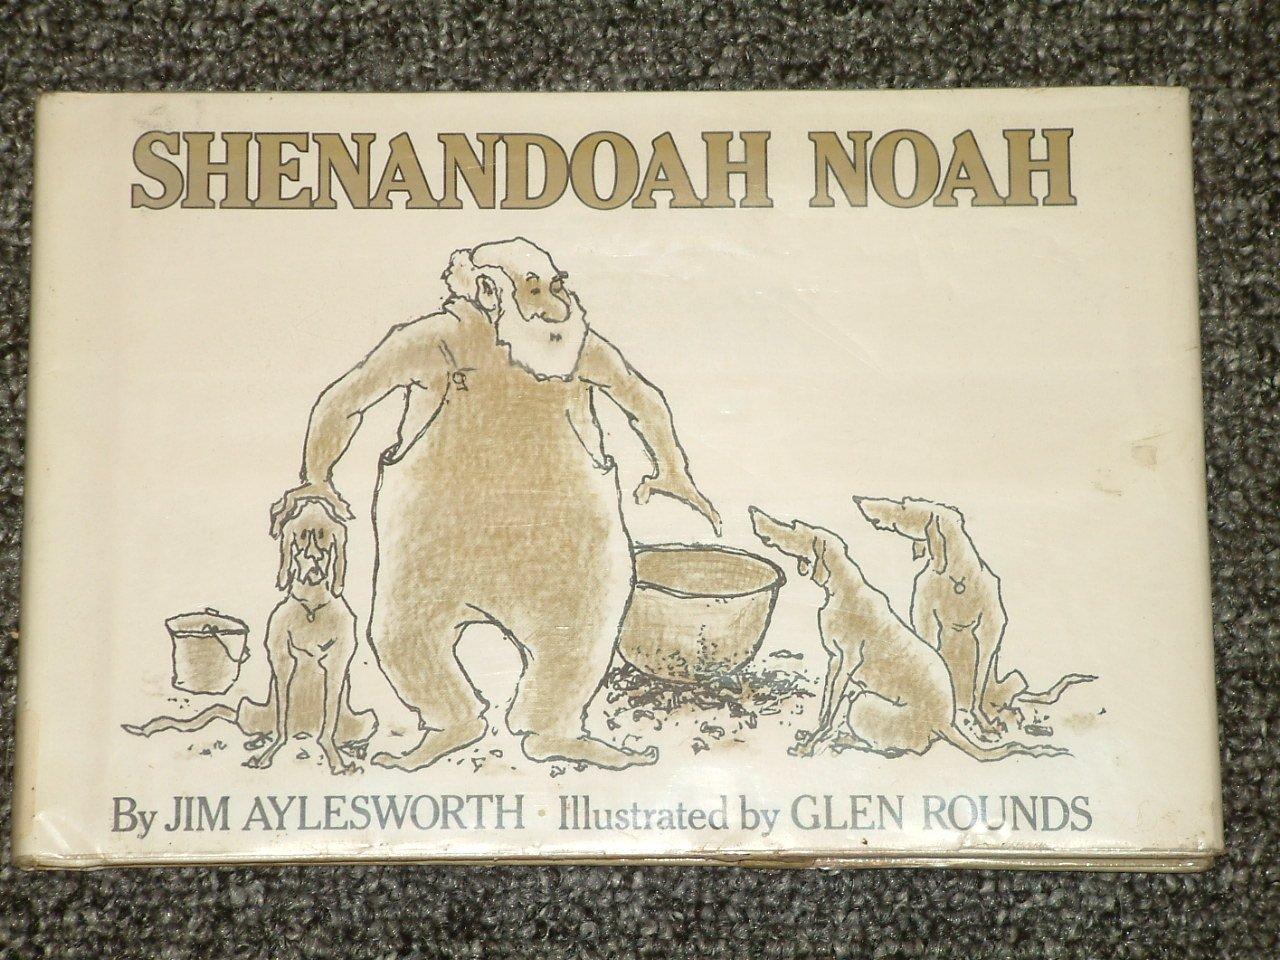 Shenandoah Noah by Jim Aylesworth and Glen Rounds